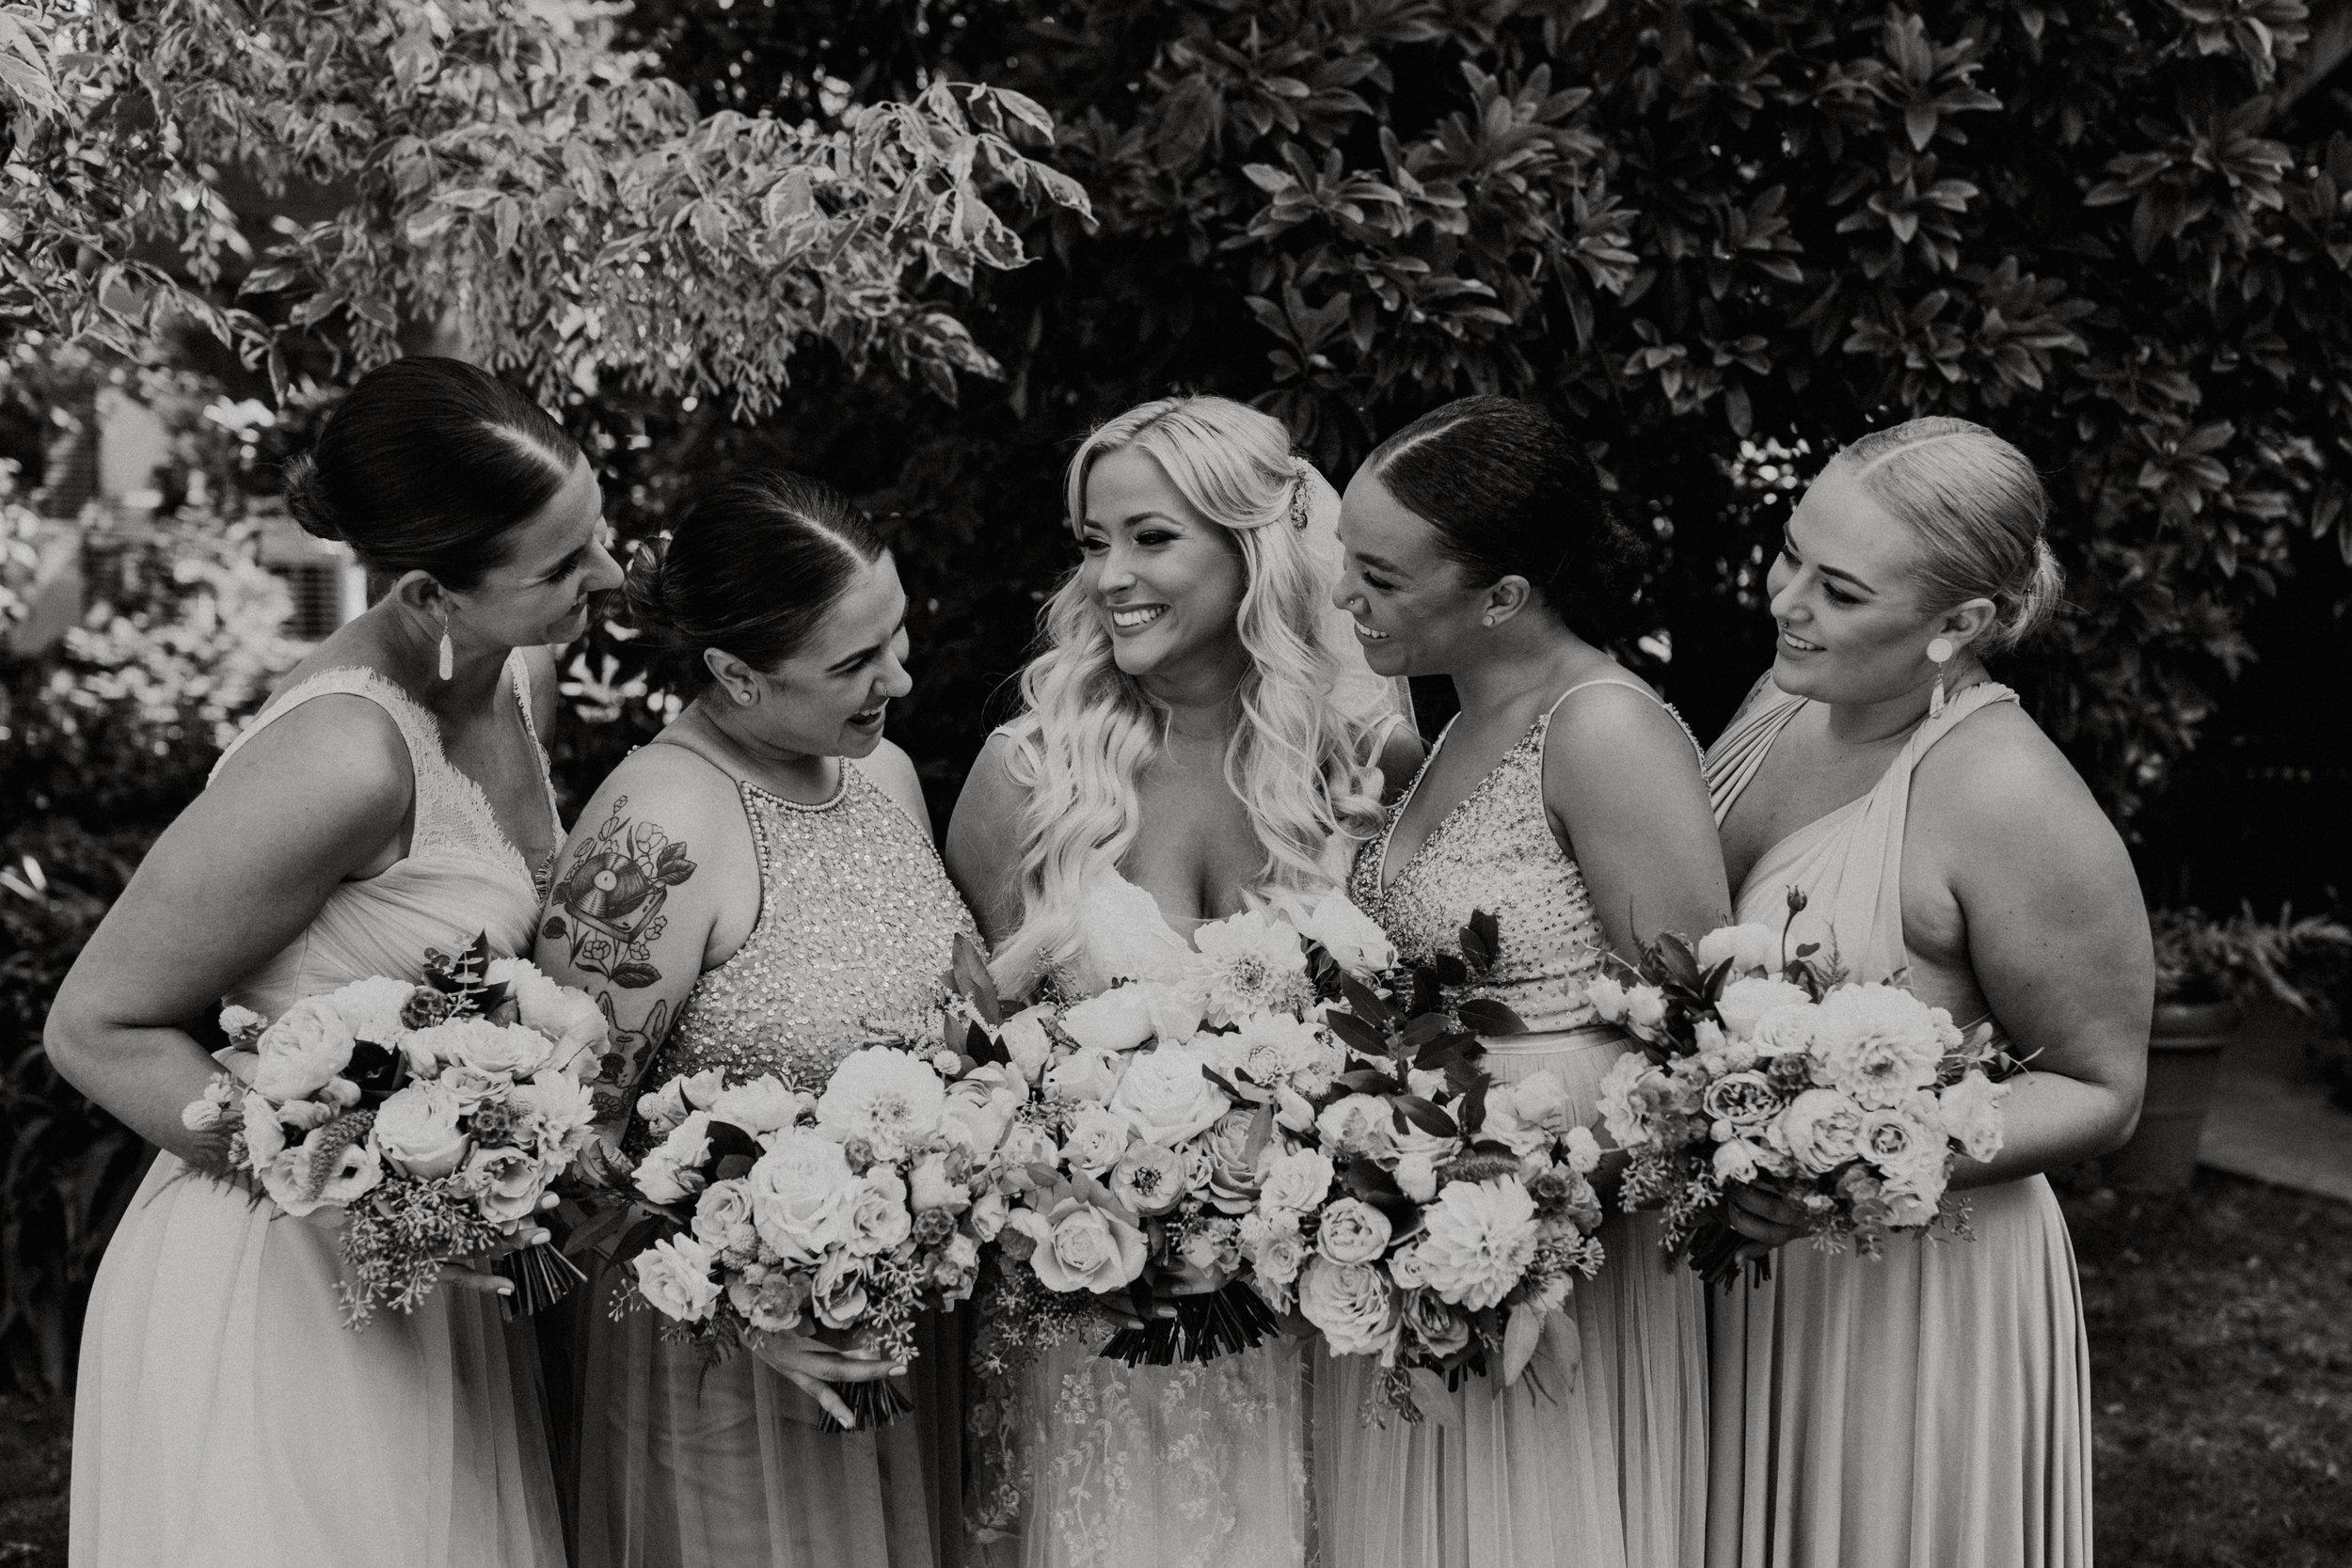 Rustic Bloom Photography | Bridesmaid Inspiration | McMenamins Grand Lodge